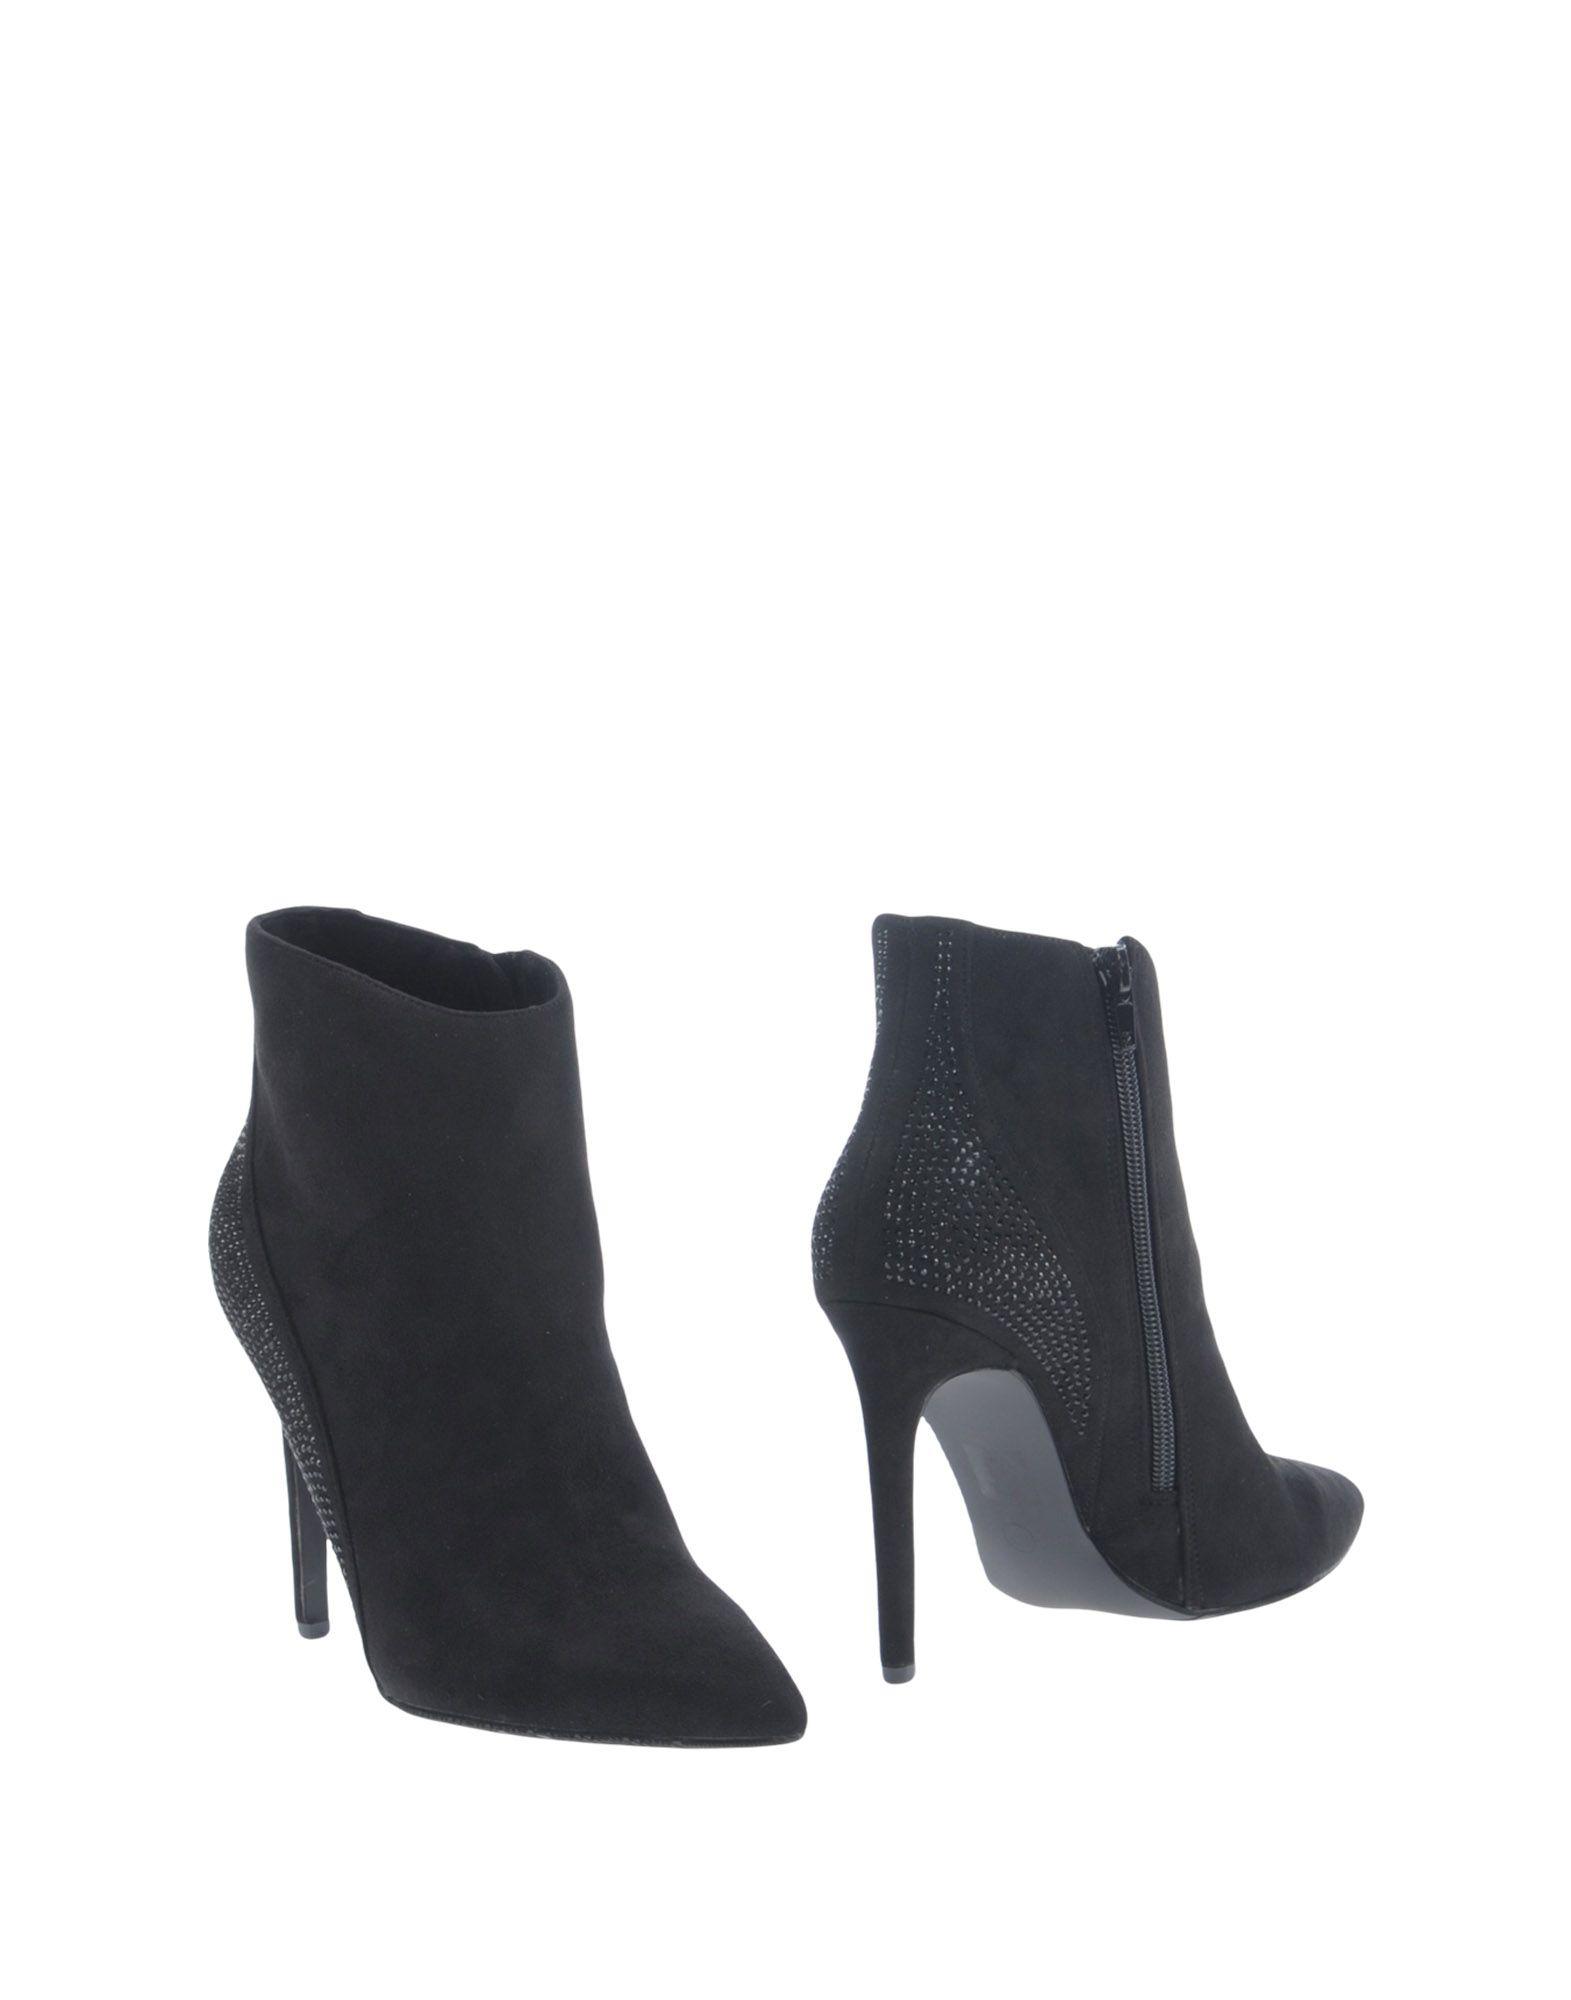 Francesco Milano Stiefelette Damen  Schuhe 11444850FS Gute Qualität beliebte Schuhe  31b896